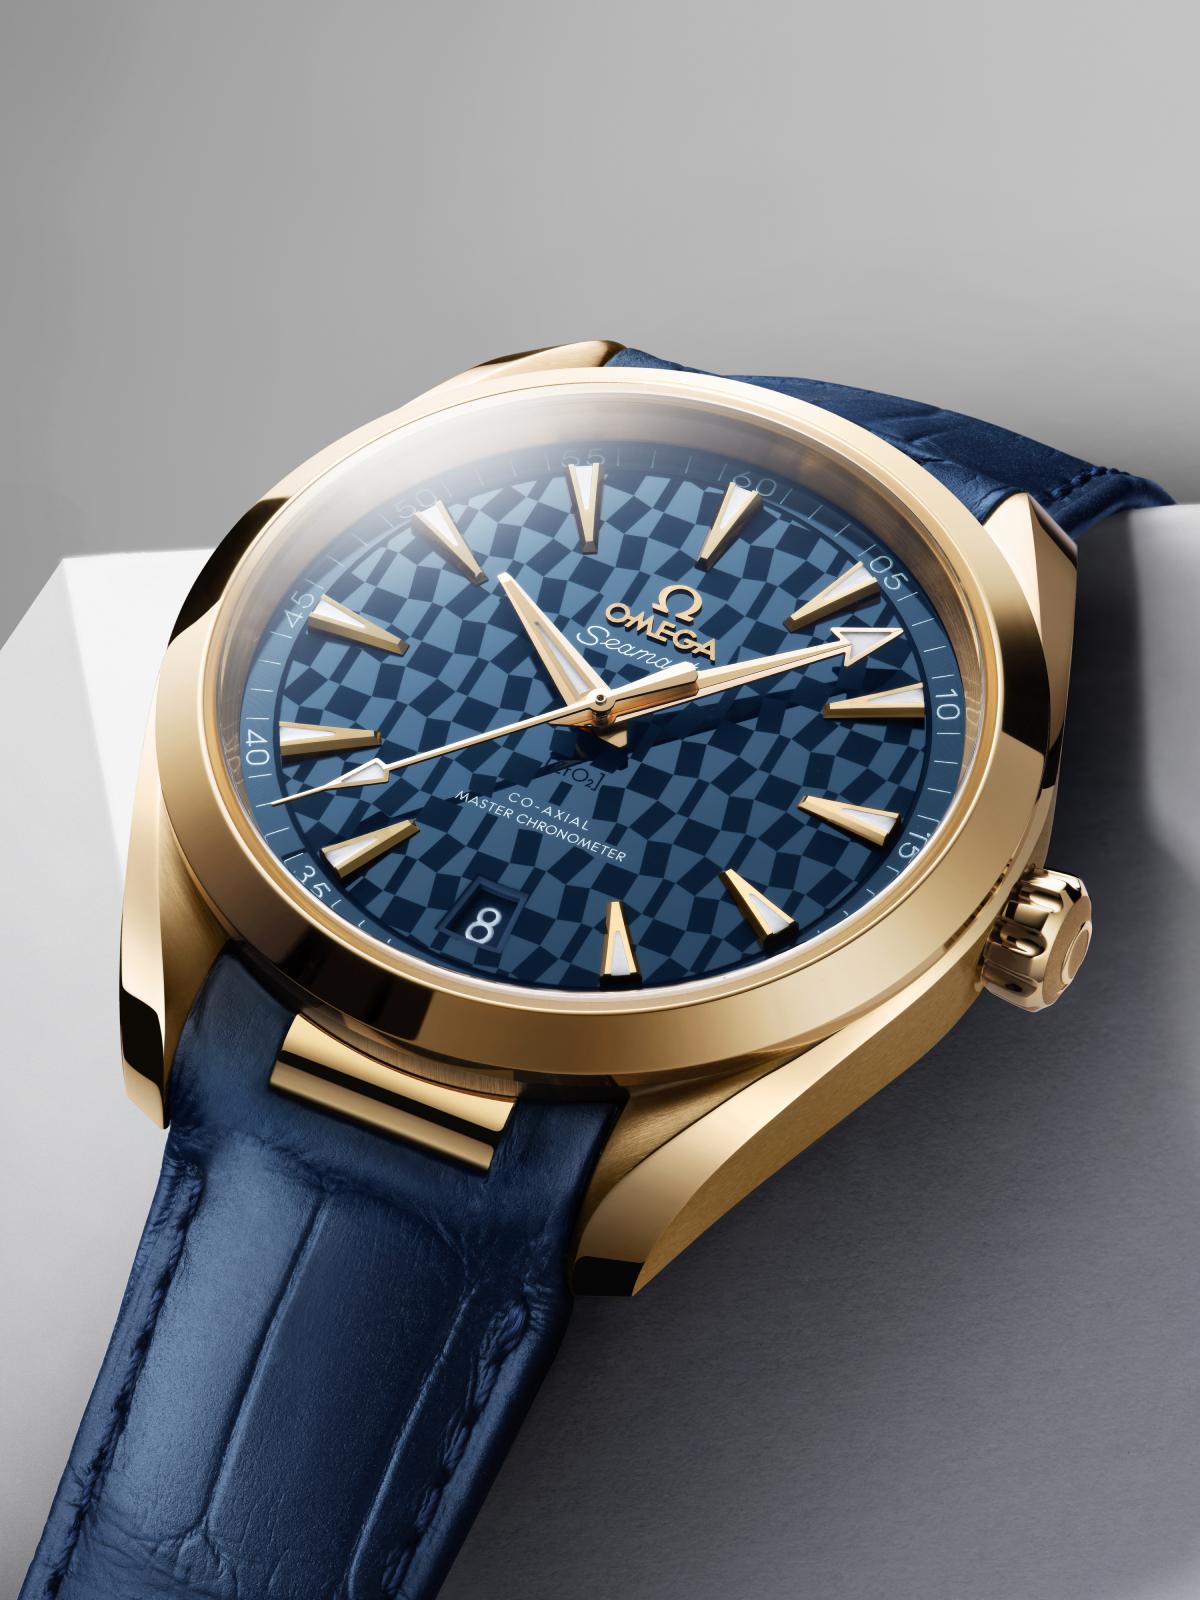 Omega Seamaster Aqua Terra Co-Axial Master Chronometer Tokio 2020